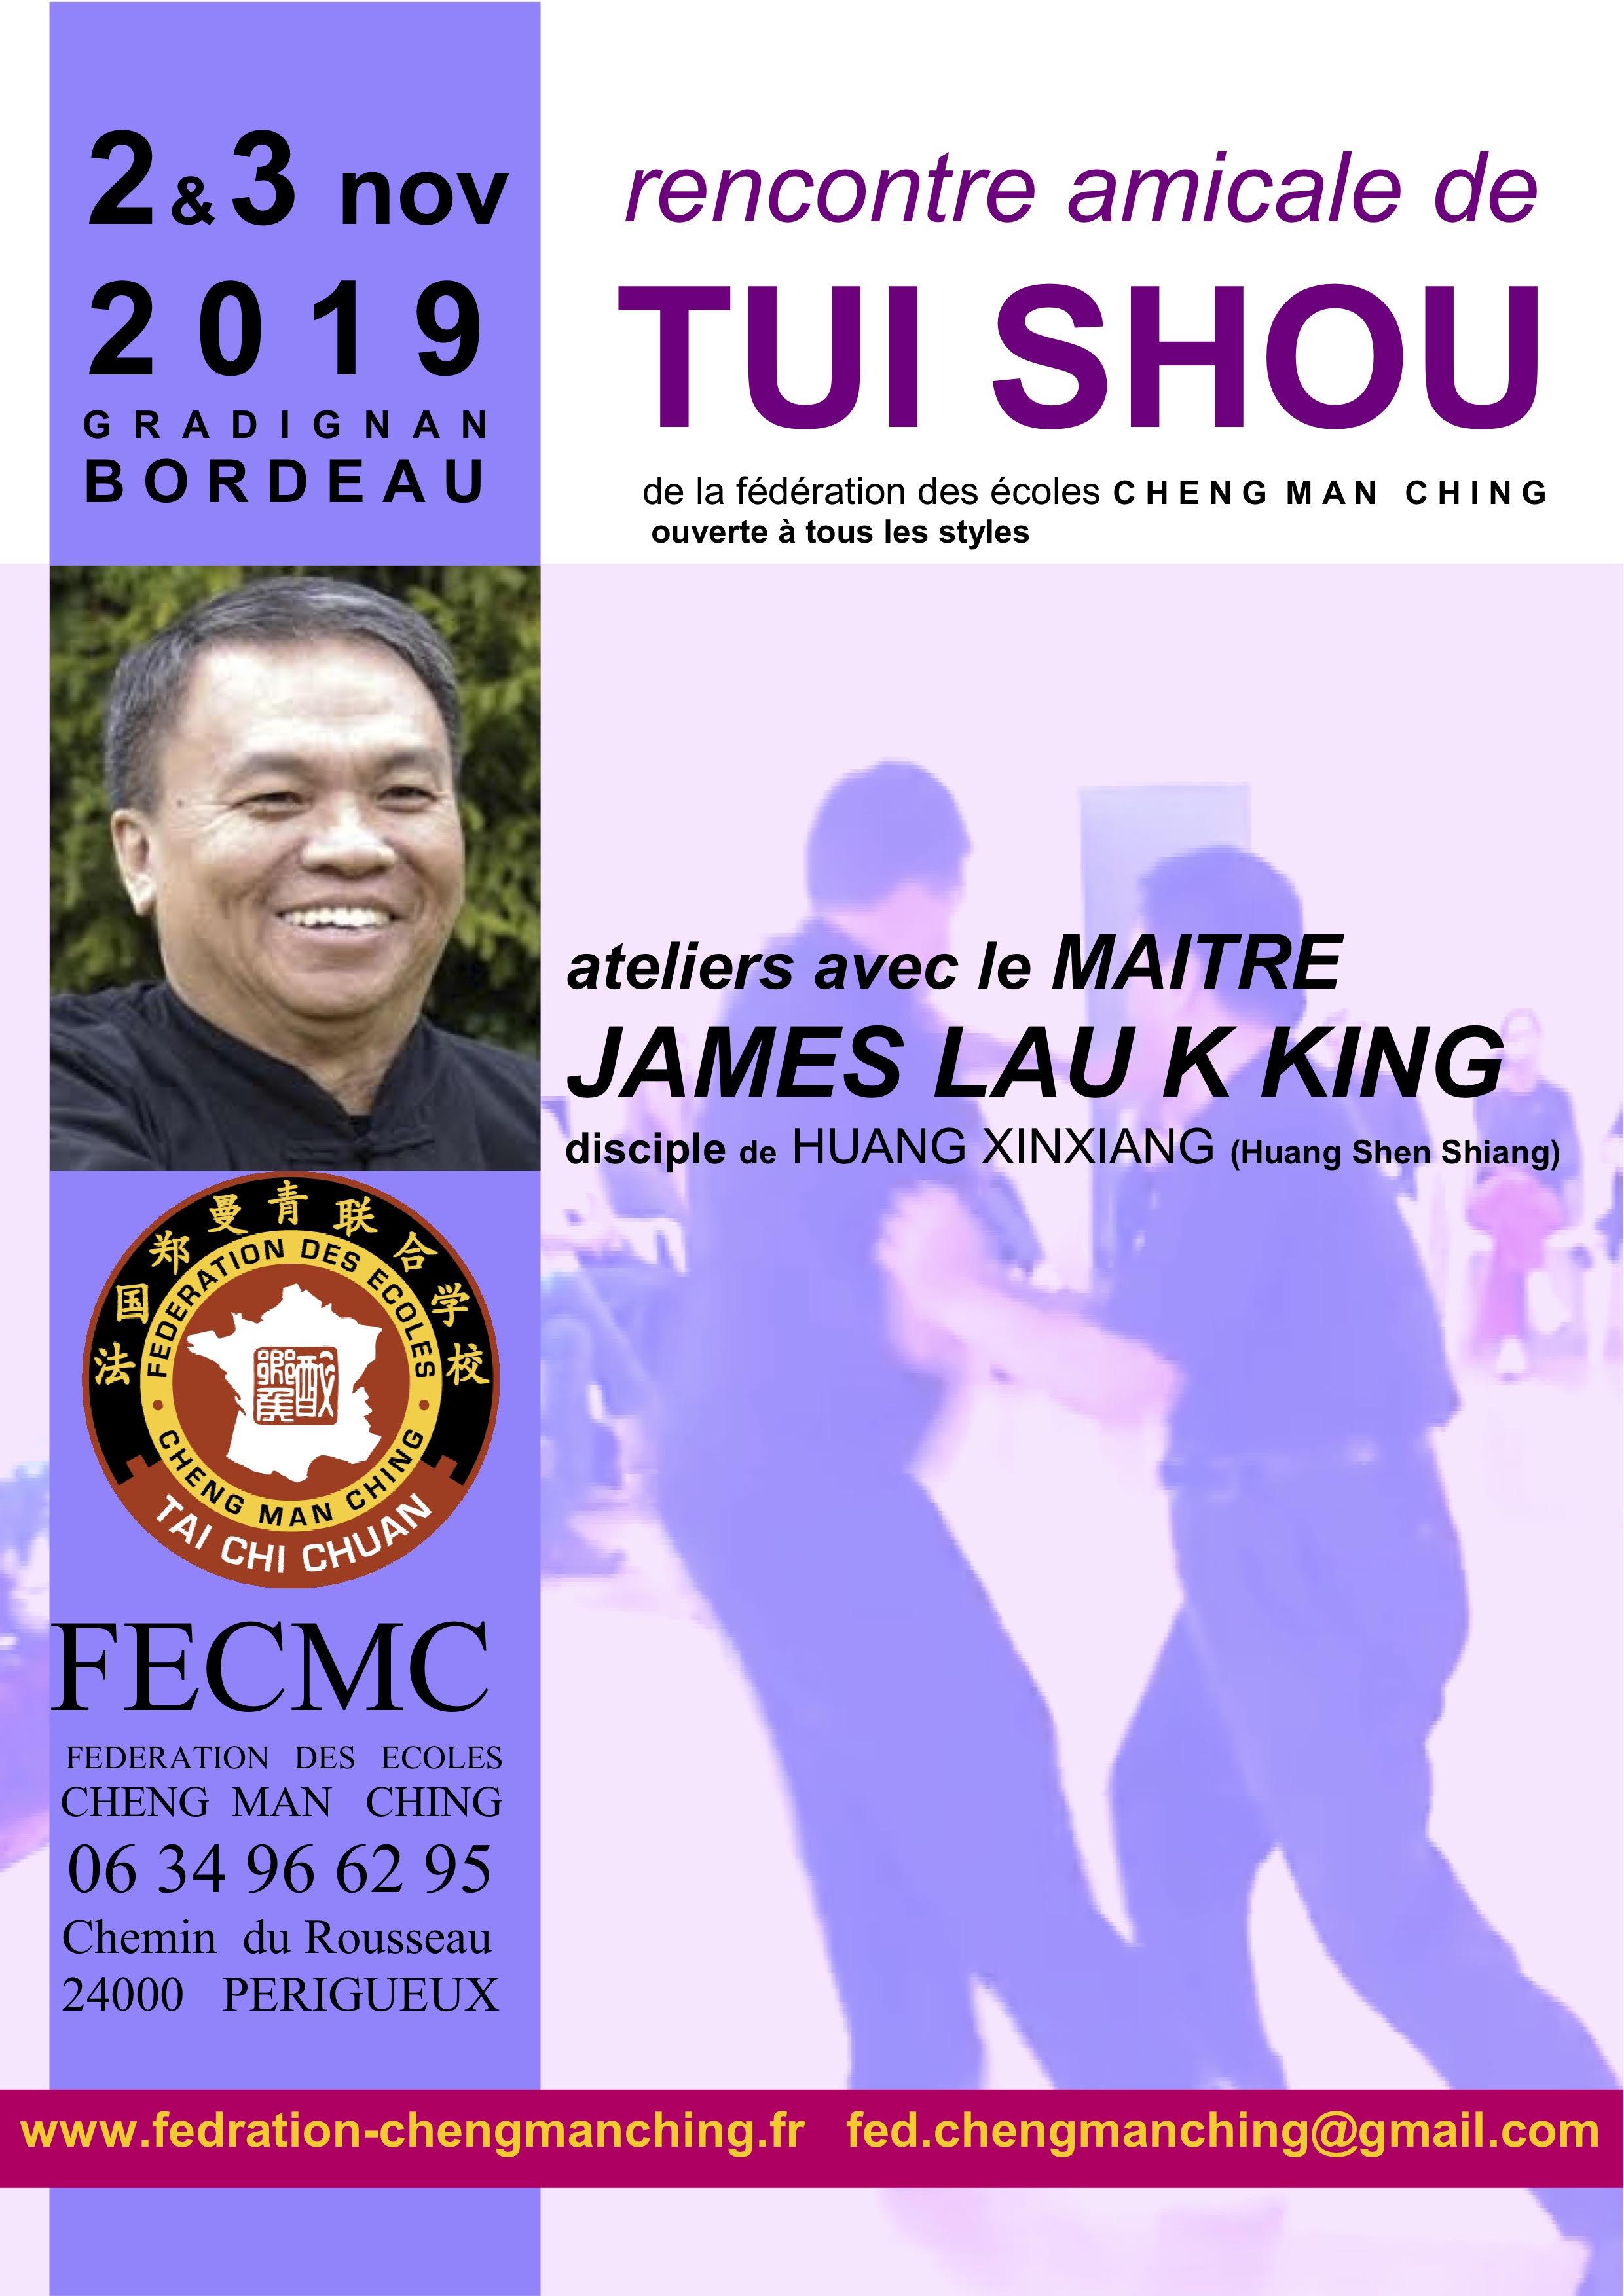 Affiche rencontre FECMC 2019